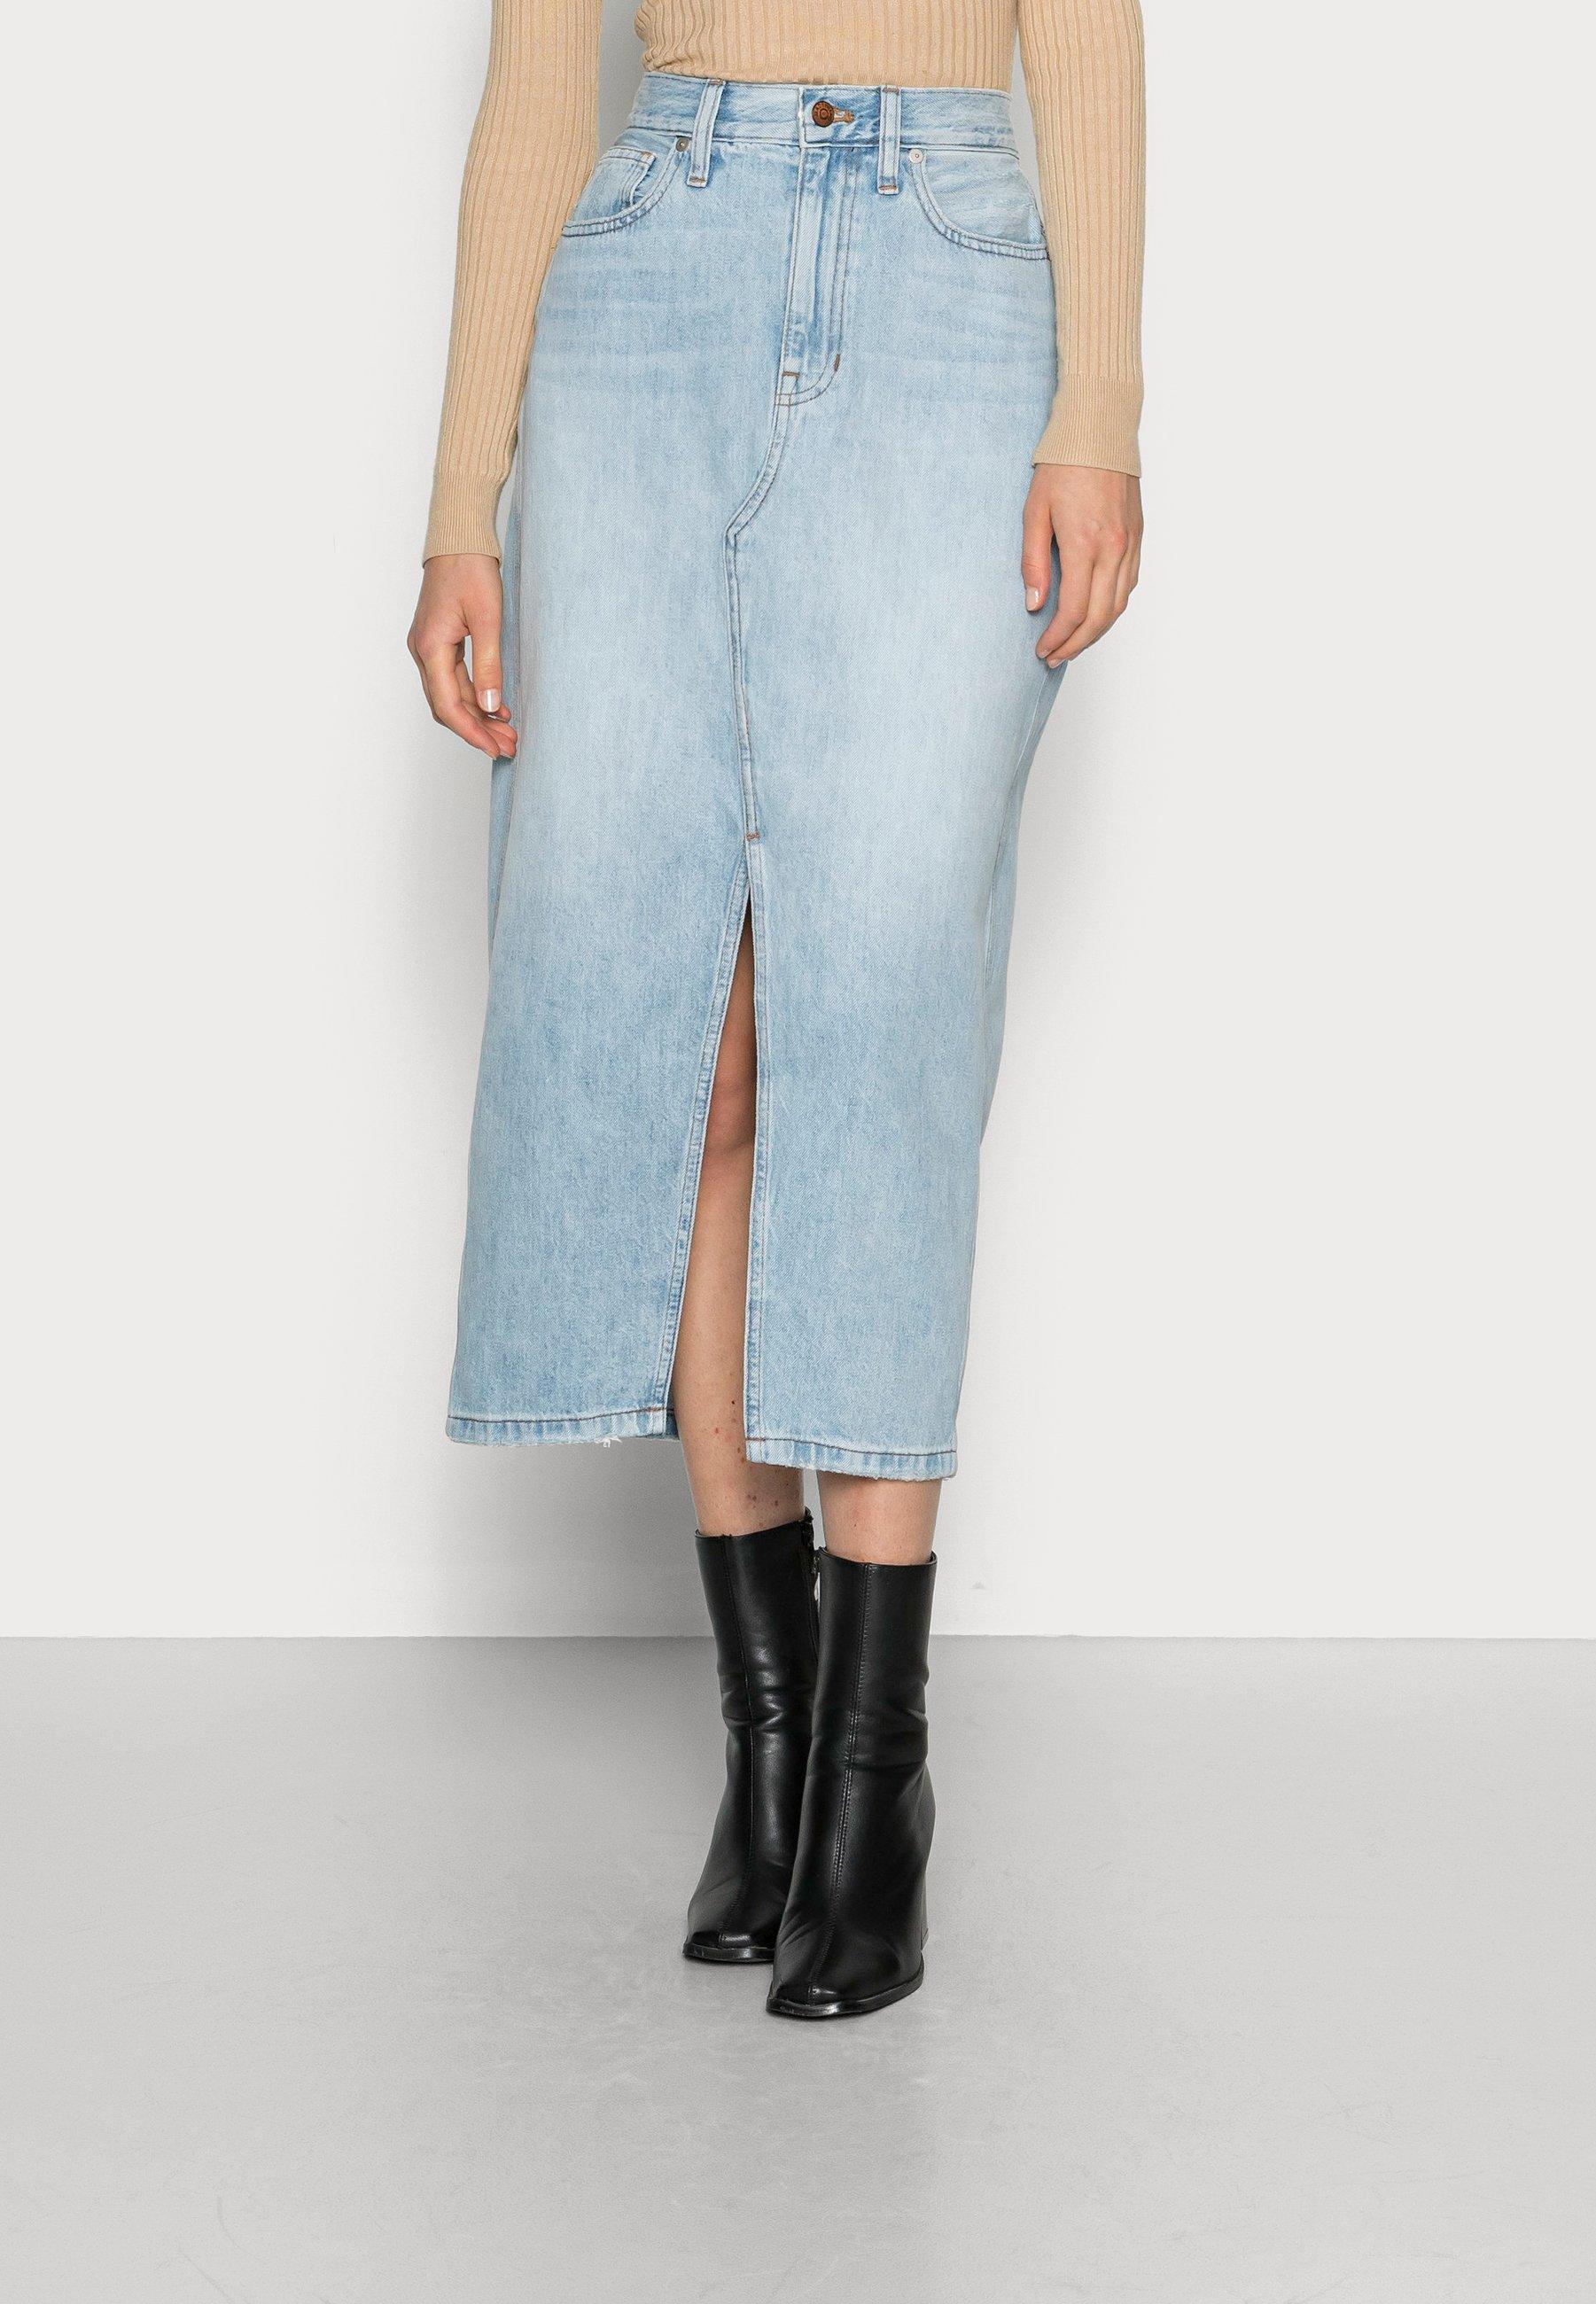 Femme LONG RECONSTRUCTED SKIRT - Jupe en jean